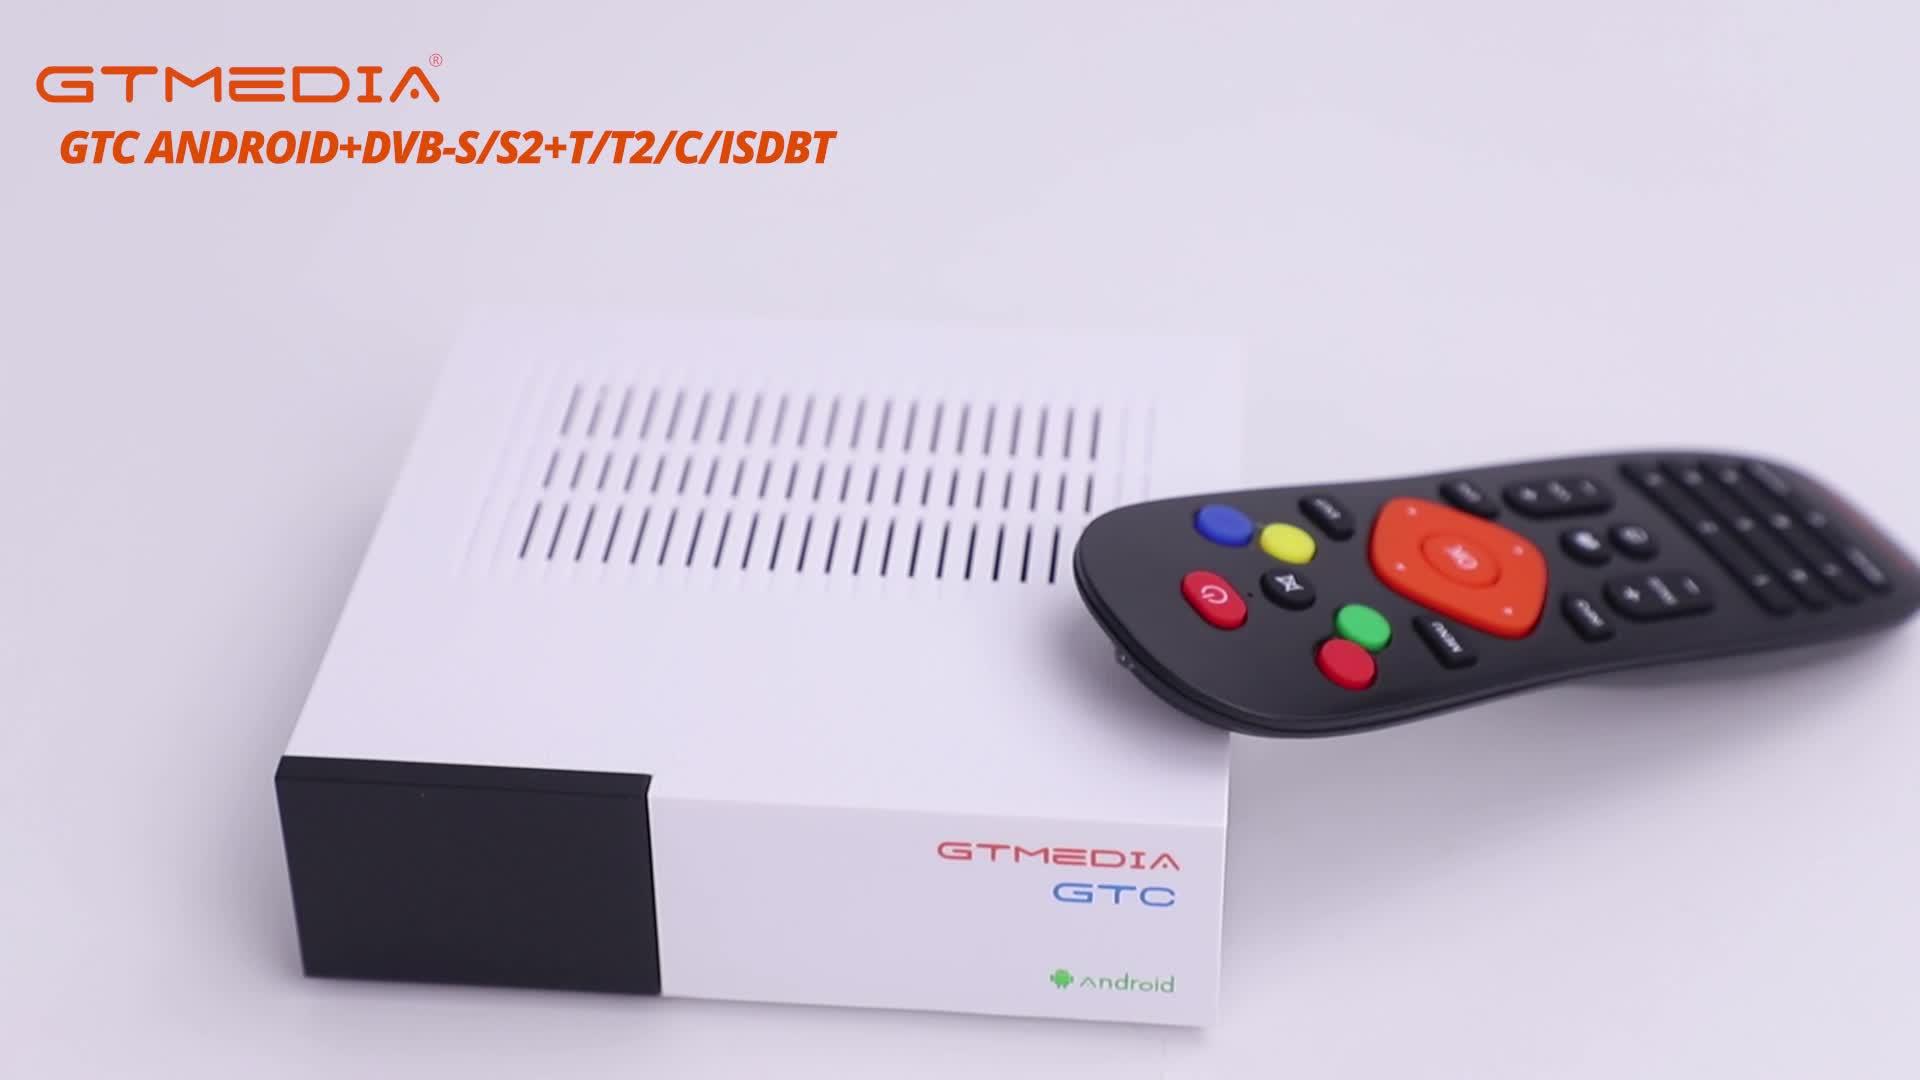 Android + DVB-S2 + T2/câble/ISDBT 2G RAM 16G ROM GTMEDIA GTC Android basé TV box récepteur Satellite numérique 4K